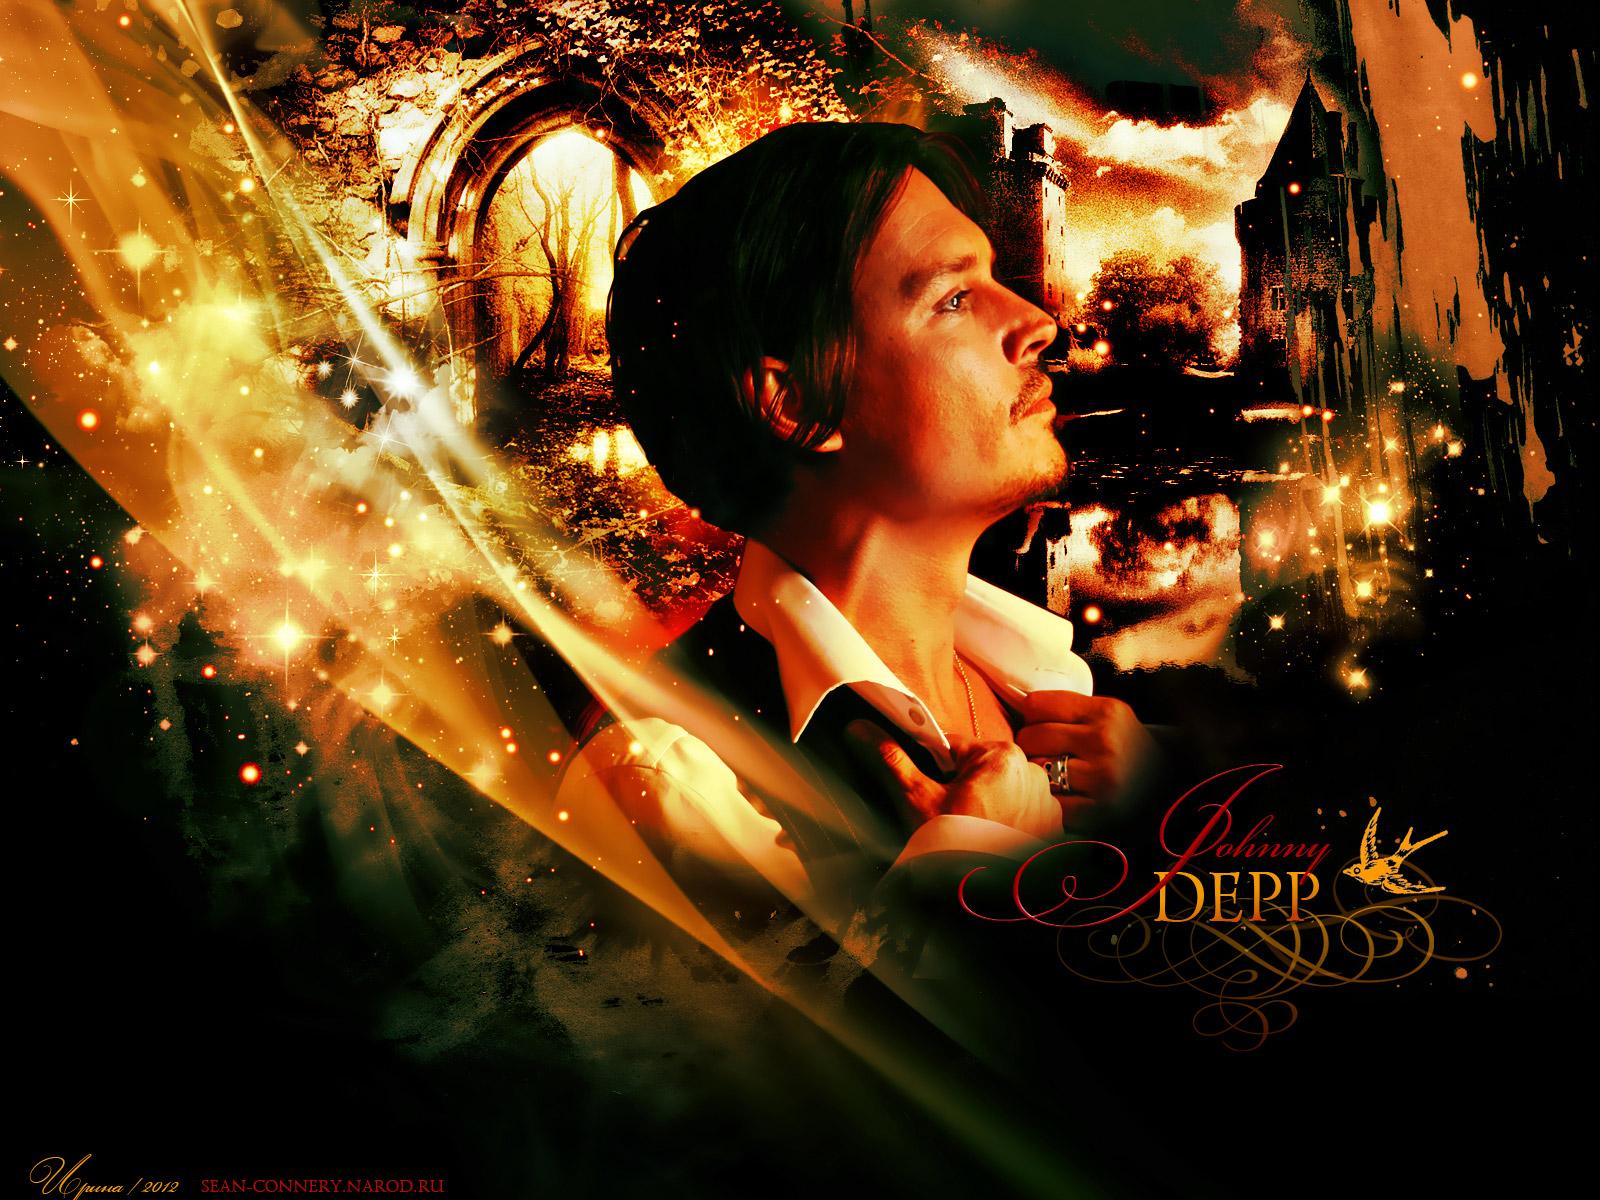 JDepp Wallpaers   Johnny Depp Wallpaper 33333607 1600x1200